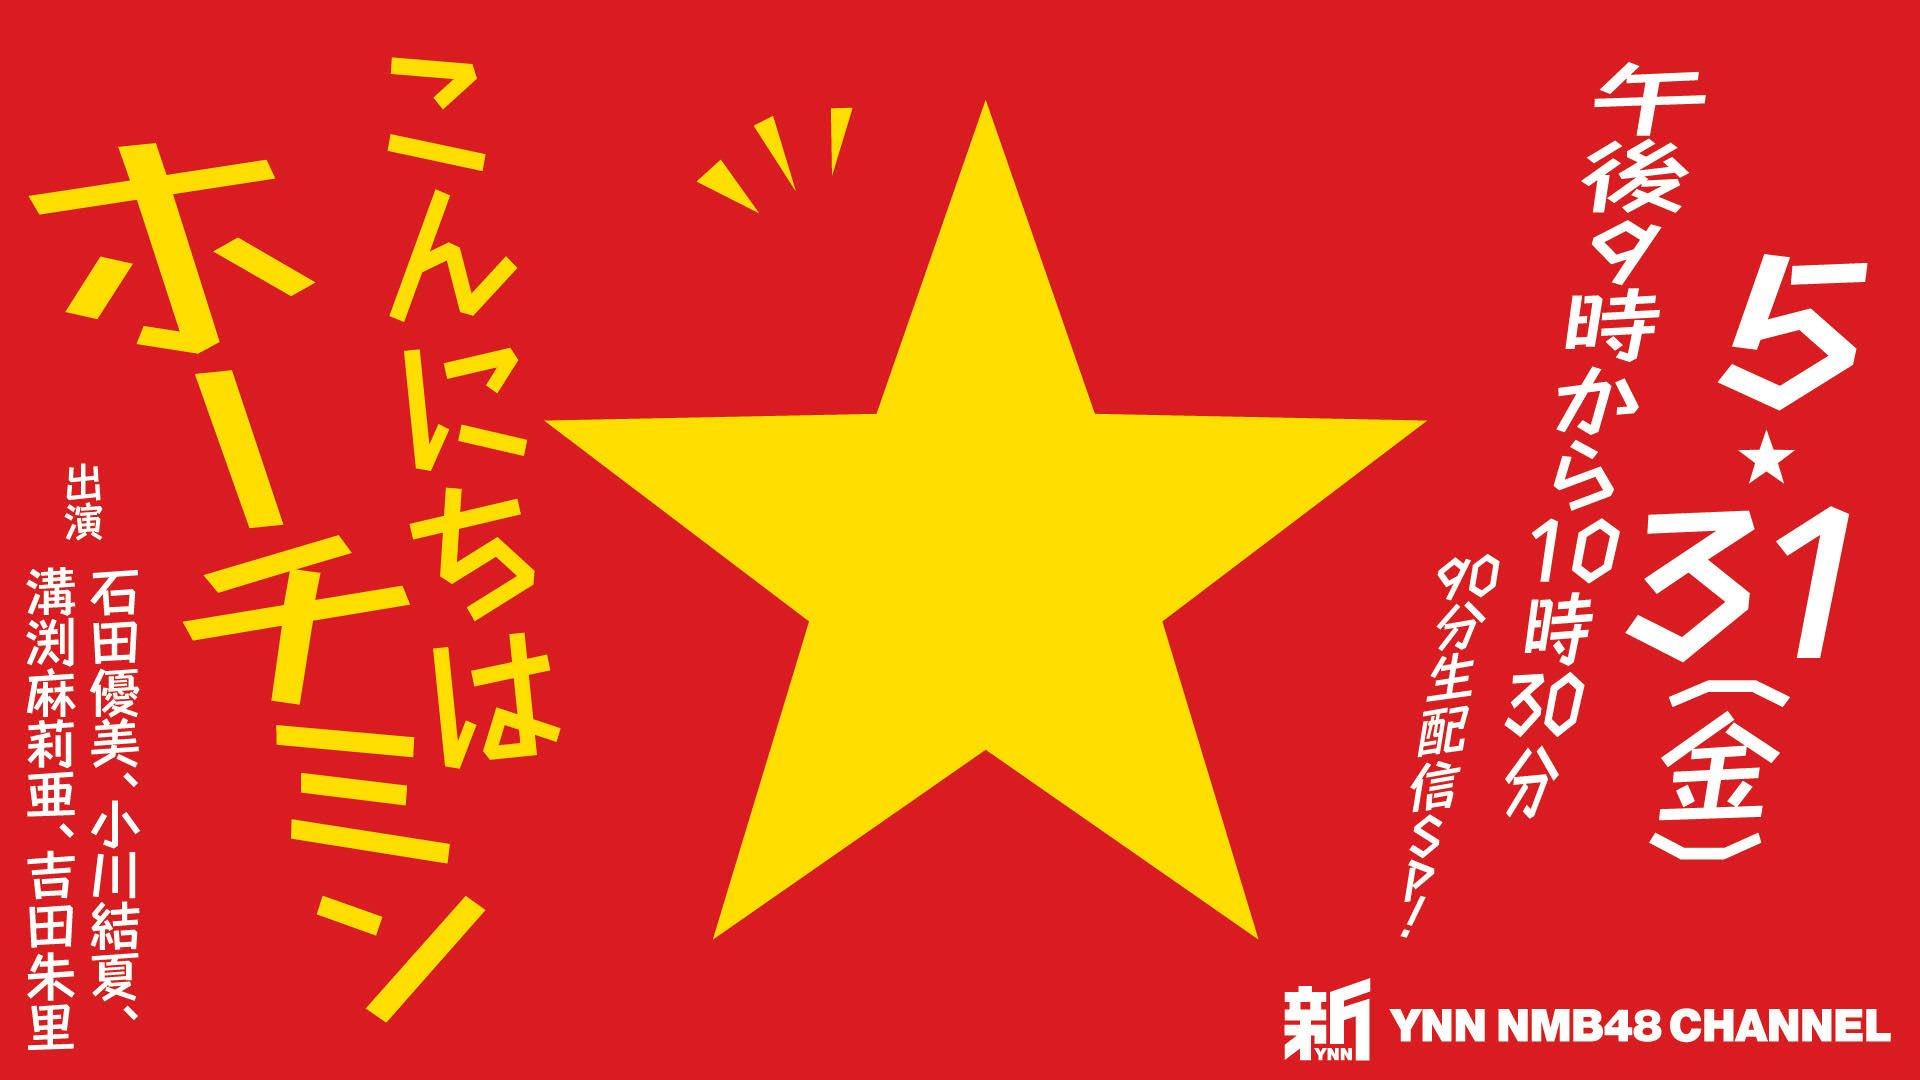 【NMB48】 石田優美、小川結夏、溝渕麻莉亜、吉田朱里出演「こんにちはホーチミン」が5/31に新YNNで生配信。